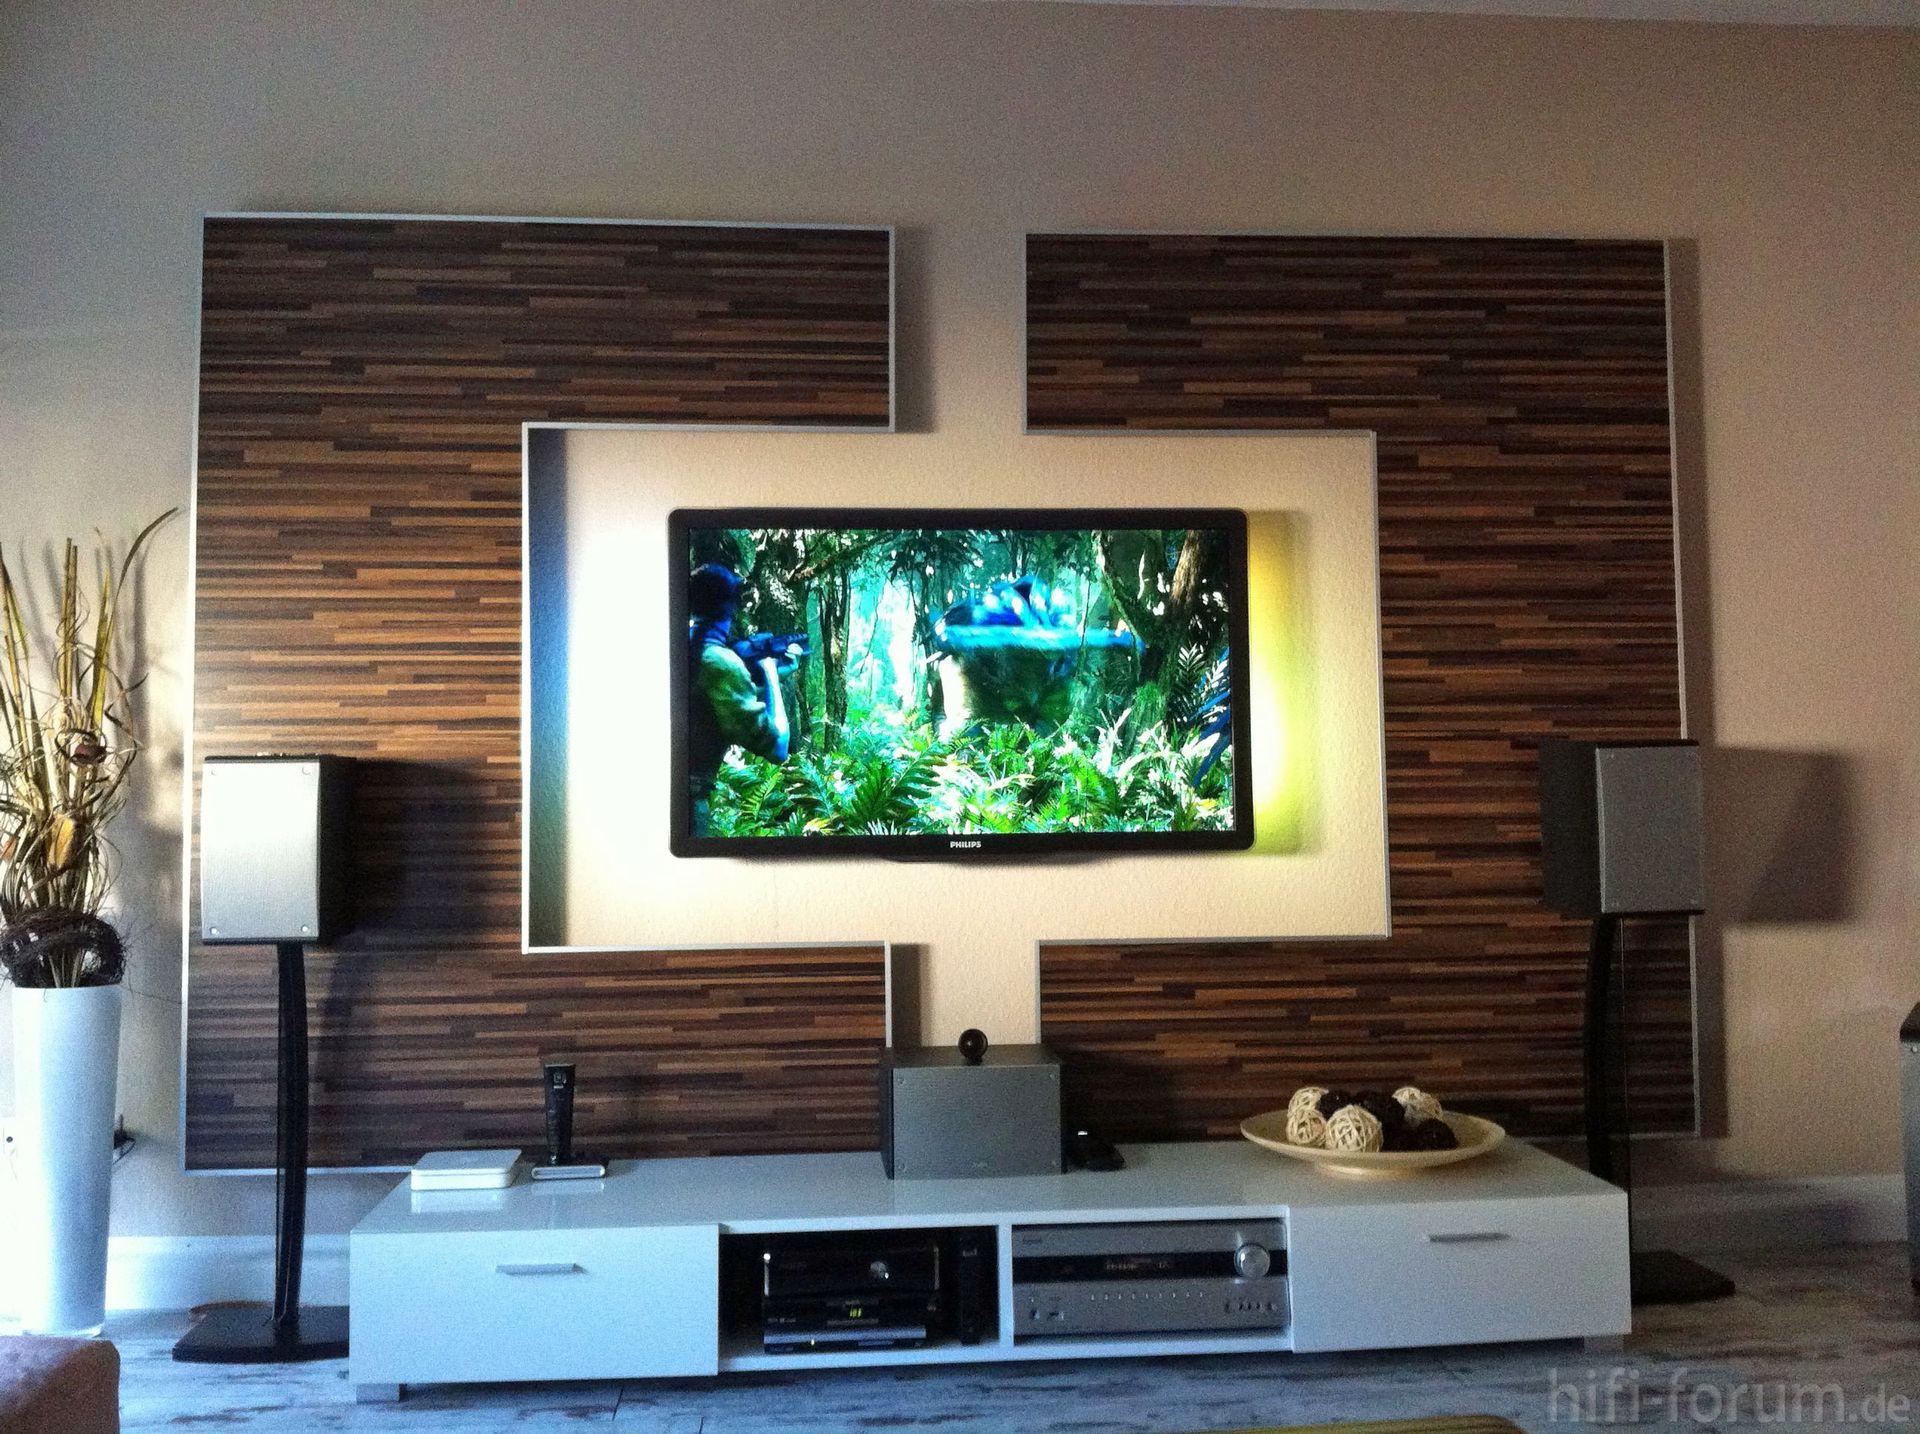 Wohnzimmer tv wand selber bauen : Wohnwand Front doityourself ...